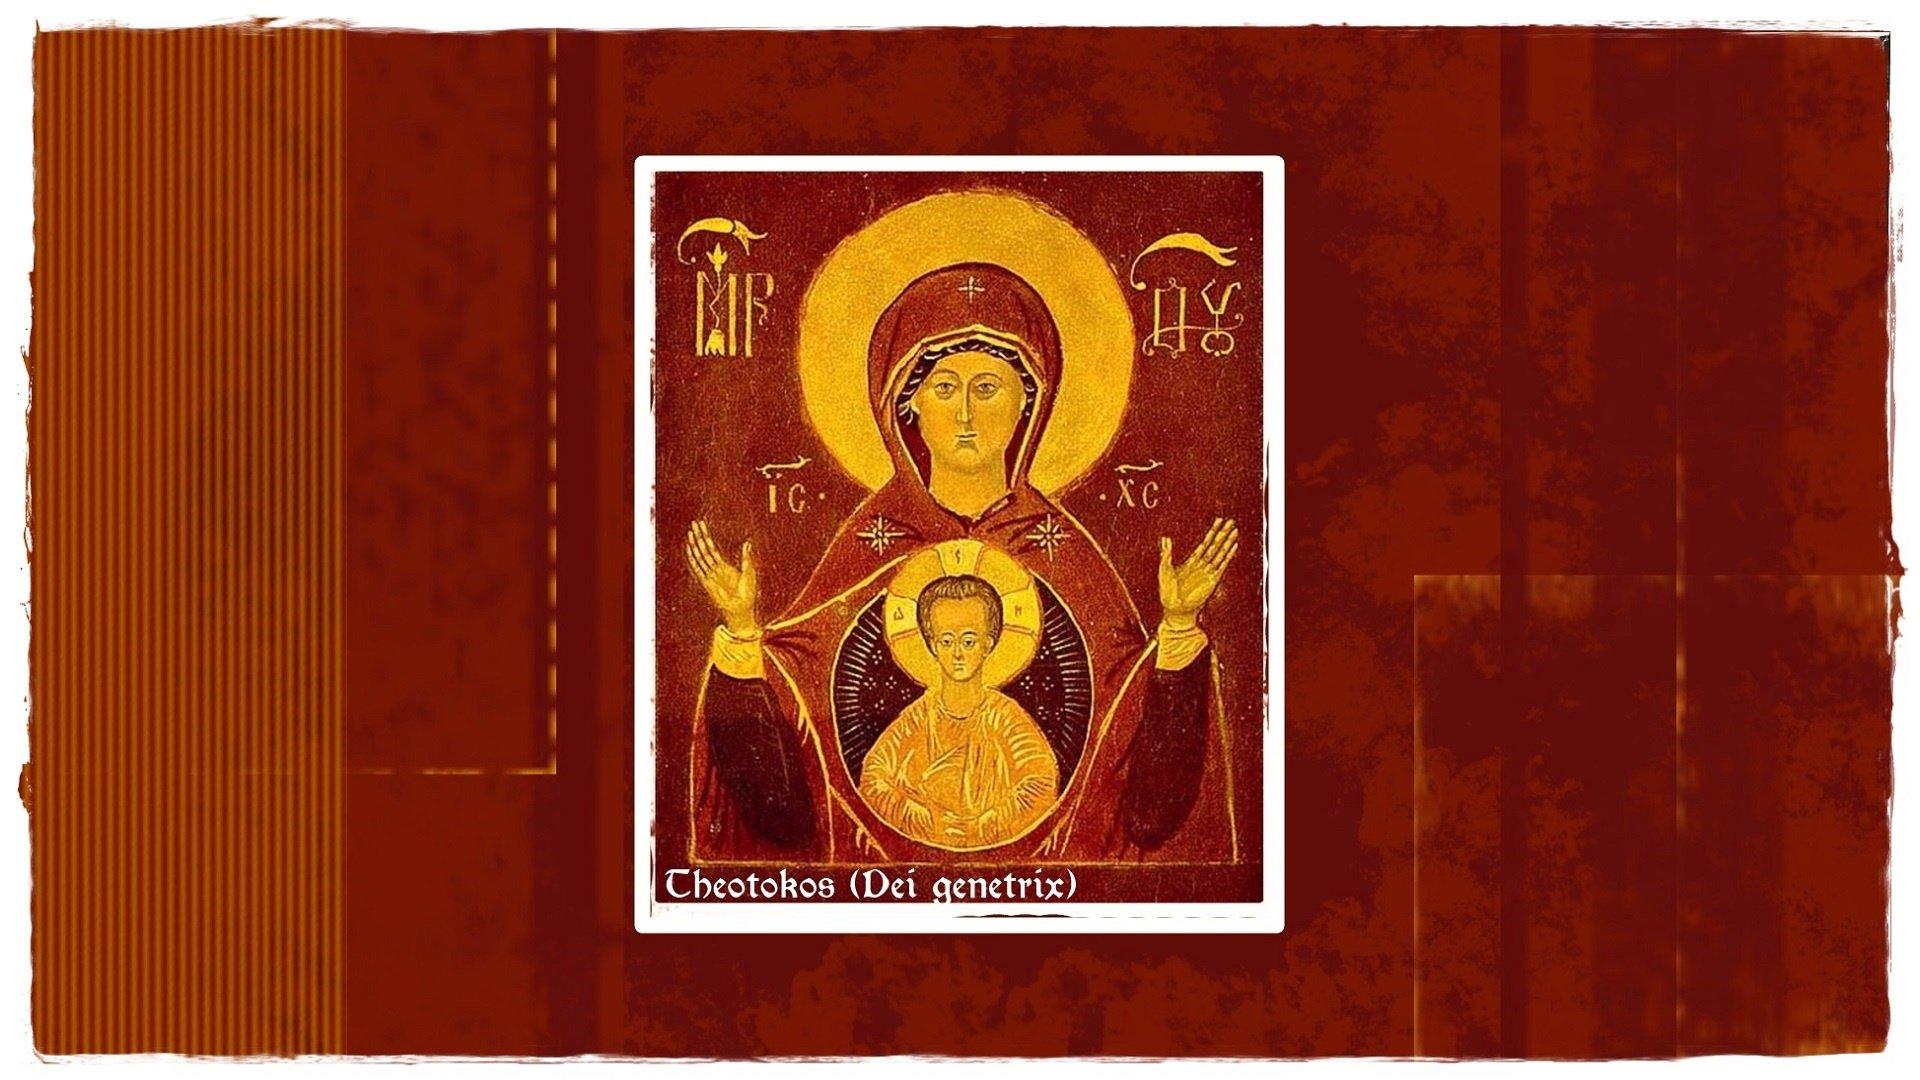 Wallpaper : 1920x1080 px, Jesus Christ, red, theotokos ...